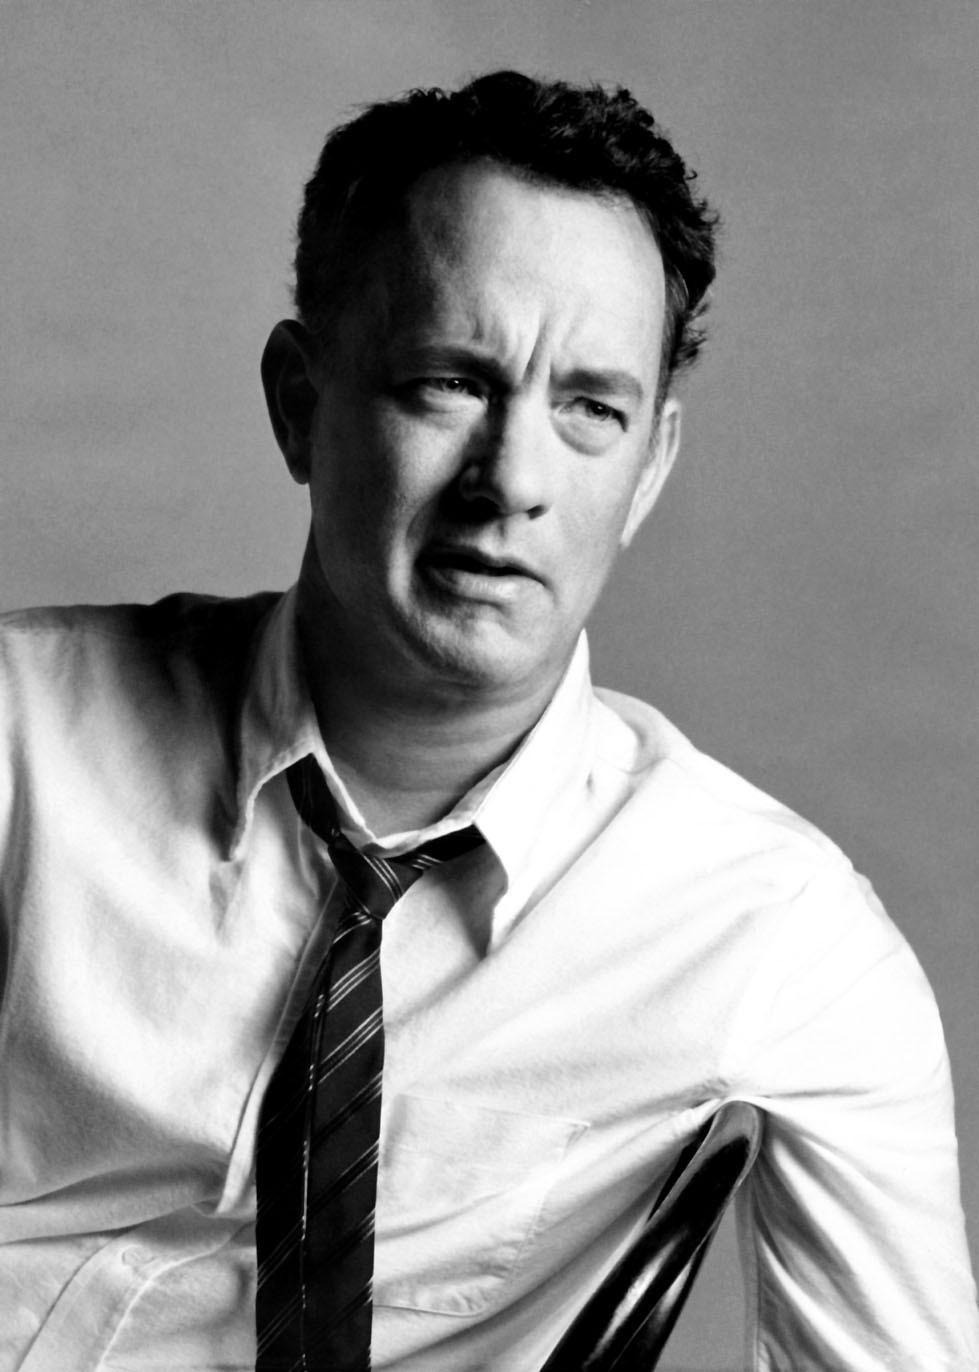 Tom Hanks - Images Gallery